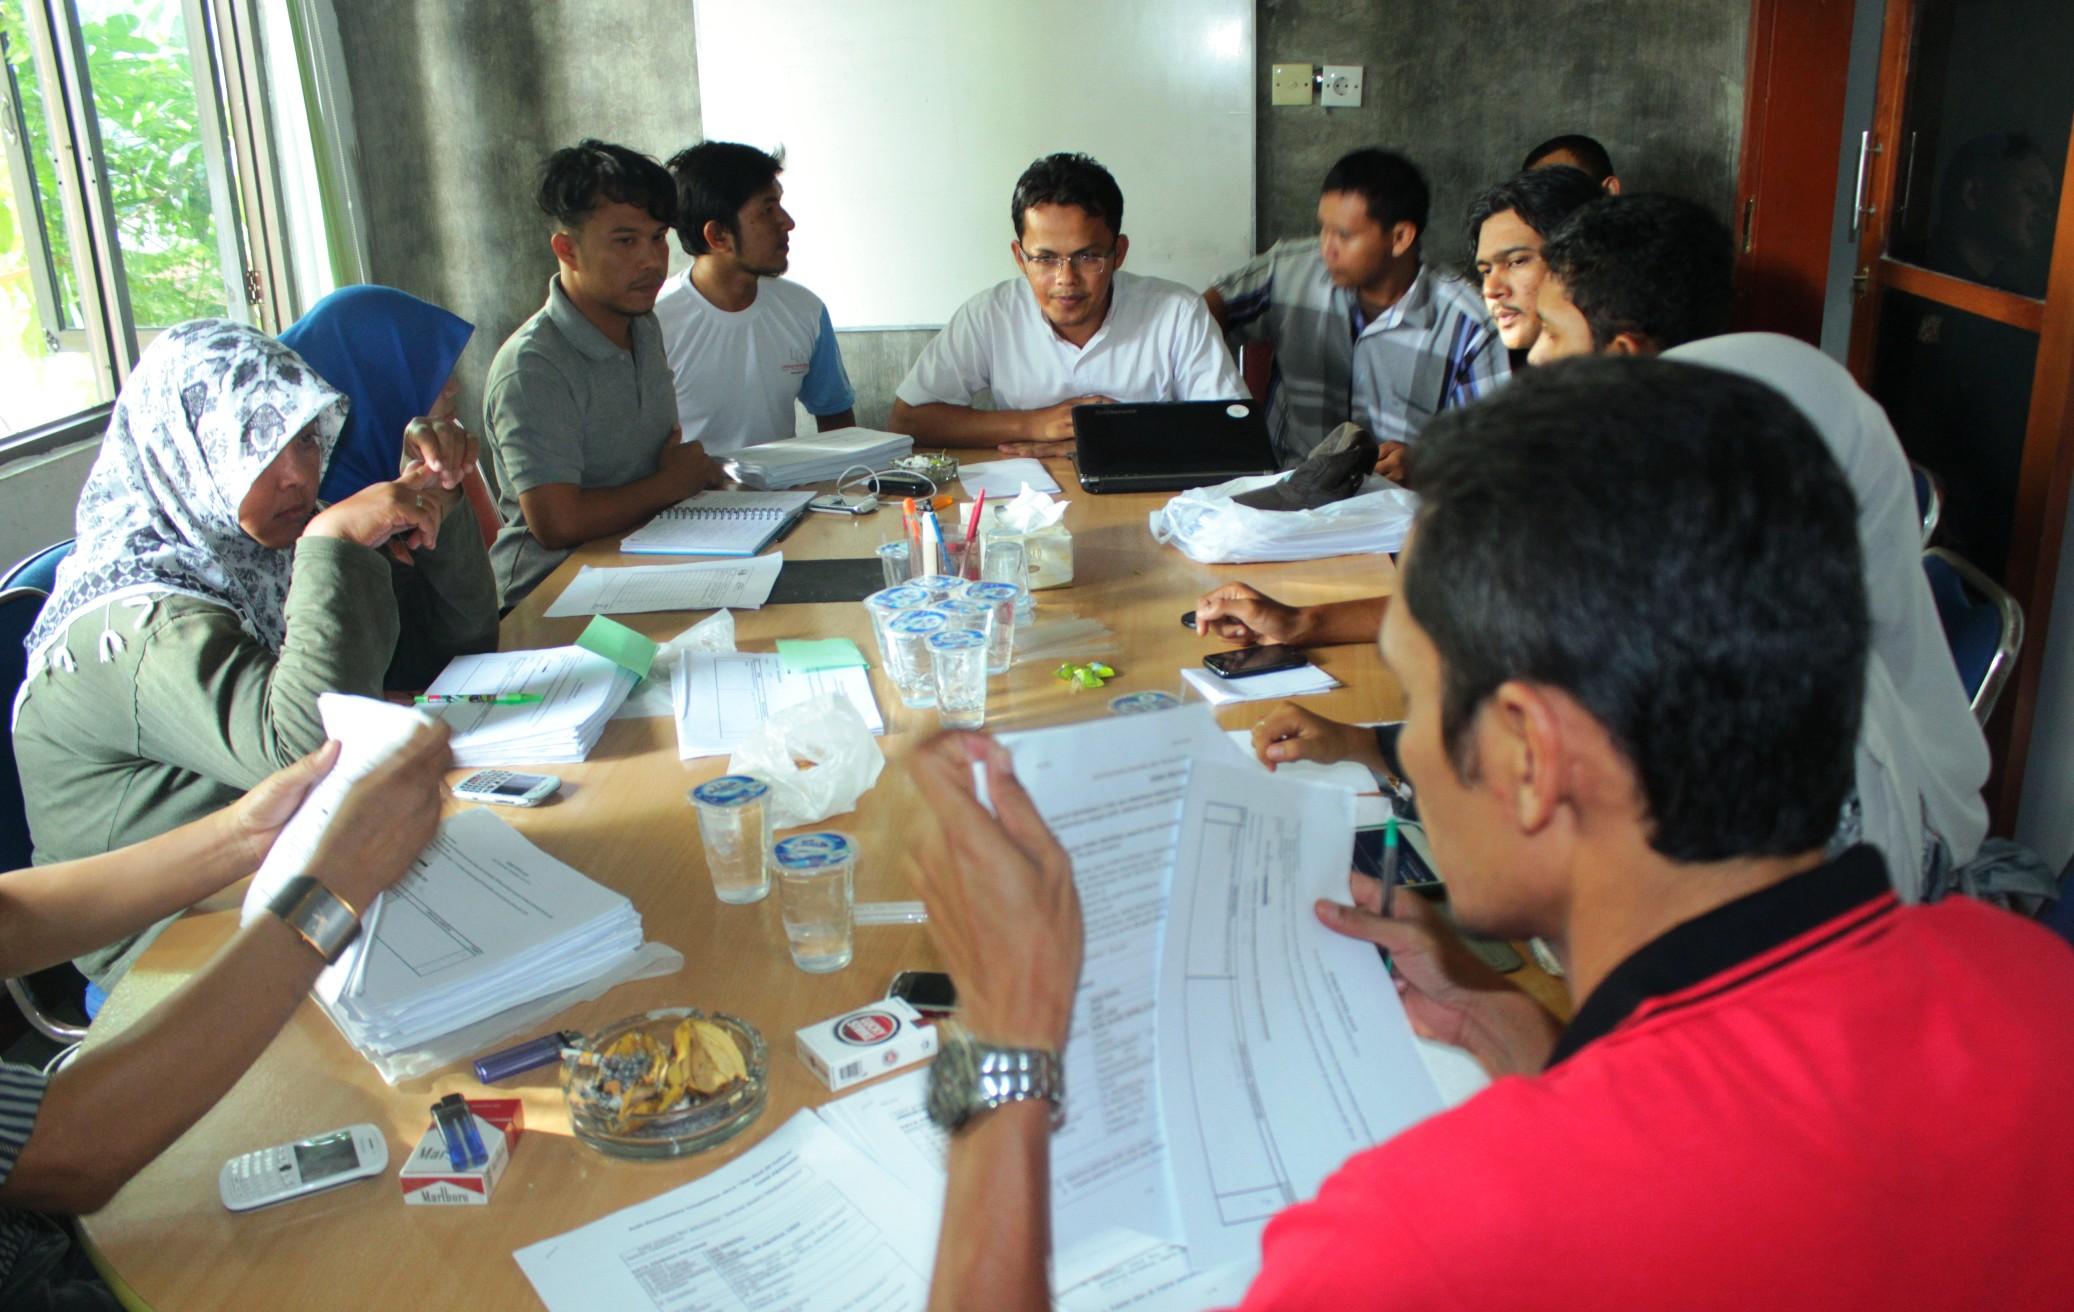 Aceh Documentary Rilis 10 Ide Terbaik Film Dokumenter